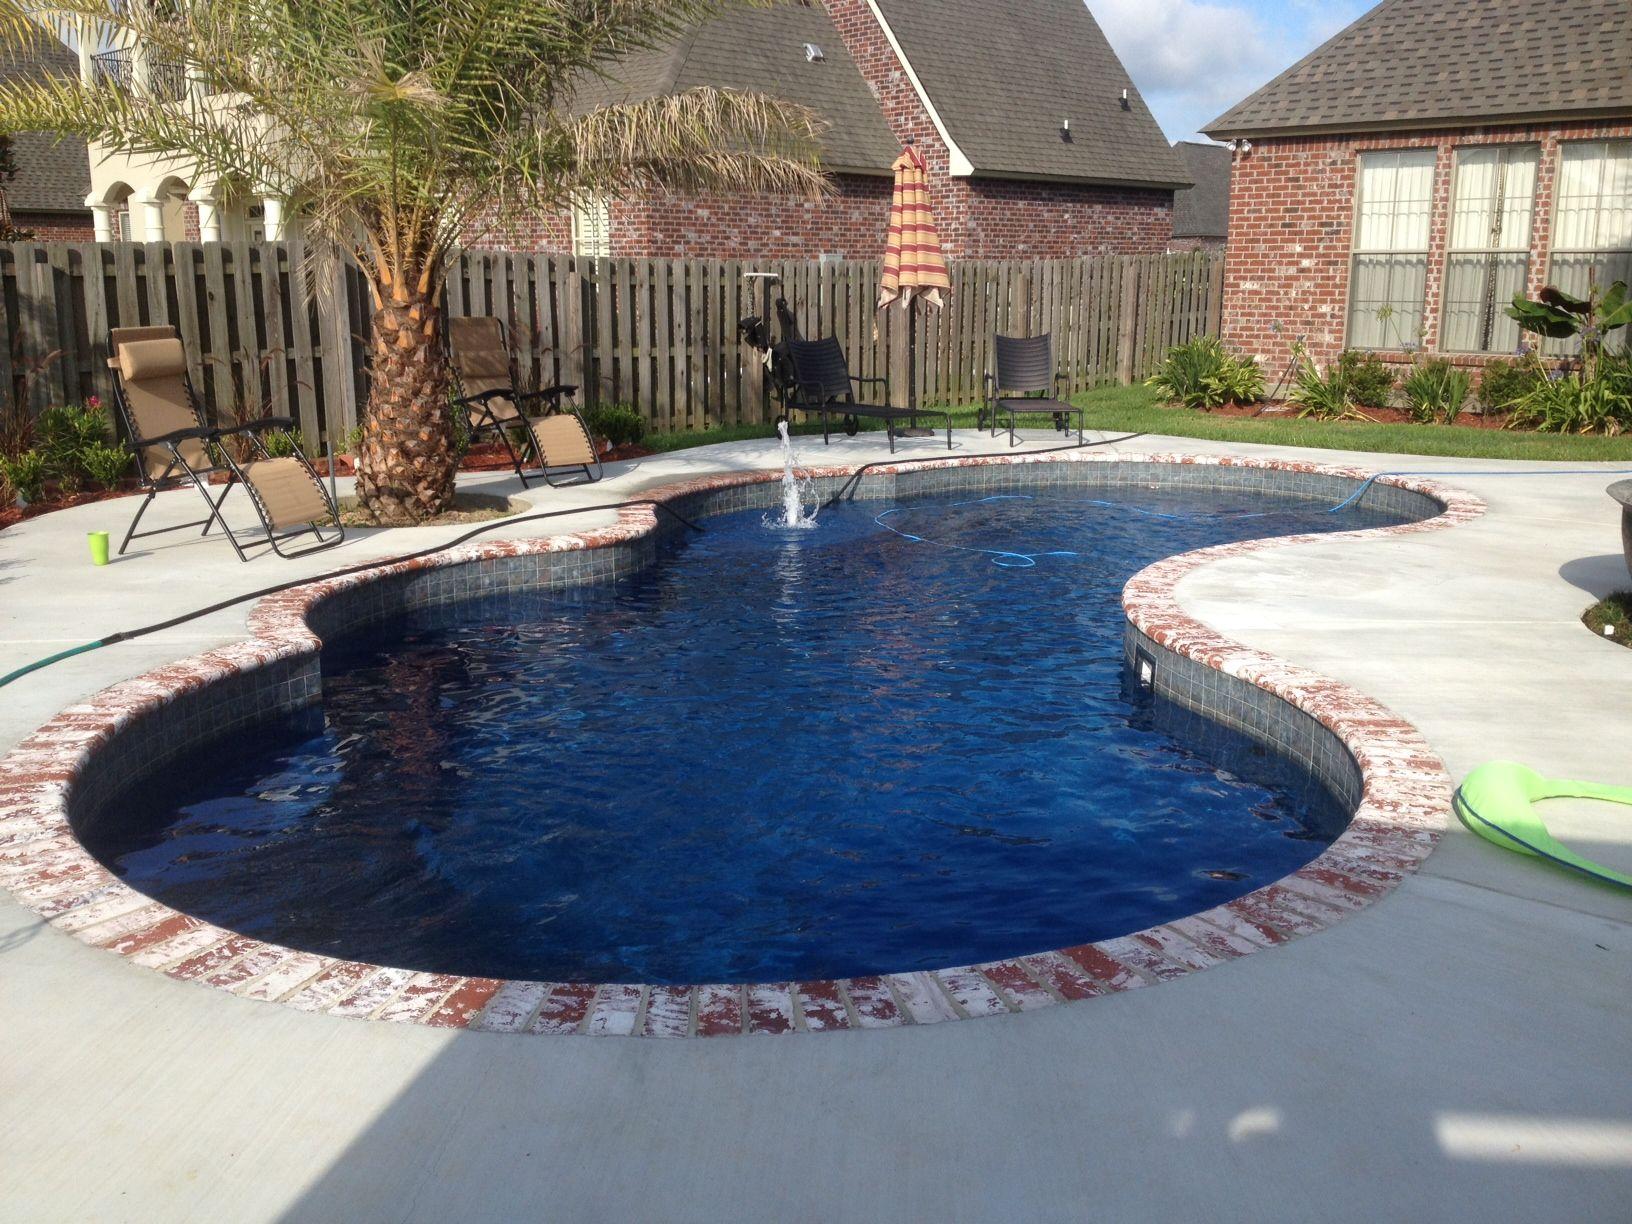 Central Pools Baton Rouge Fiberglass Pools Small Swimming Pools Swimming Pools Pool Designs